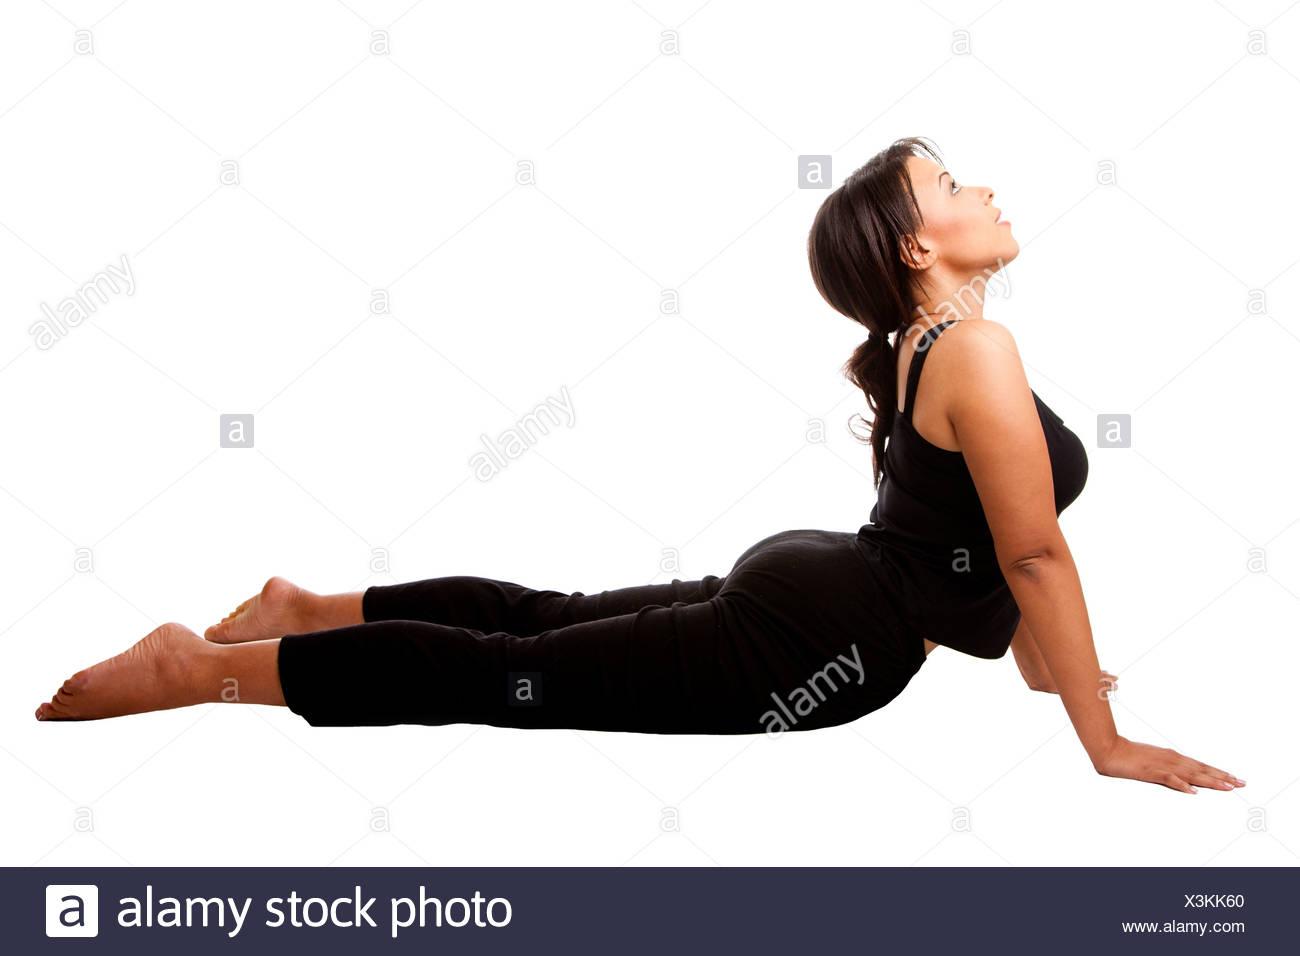 Cobra position Yoga Excercise - Stock Image